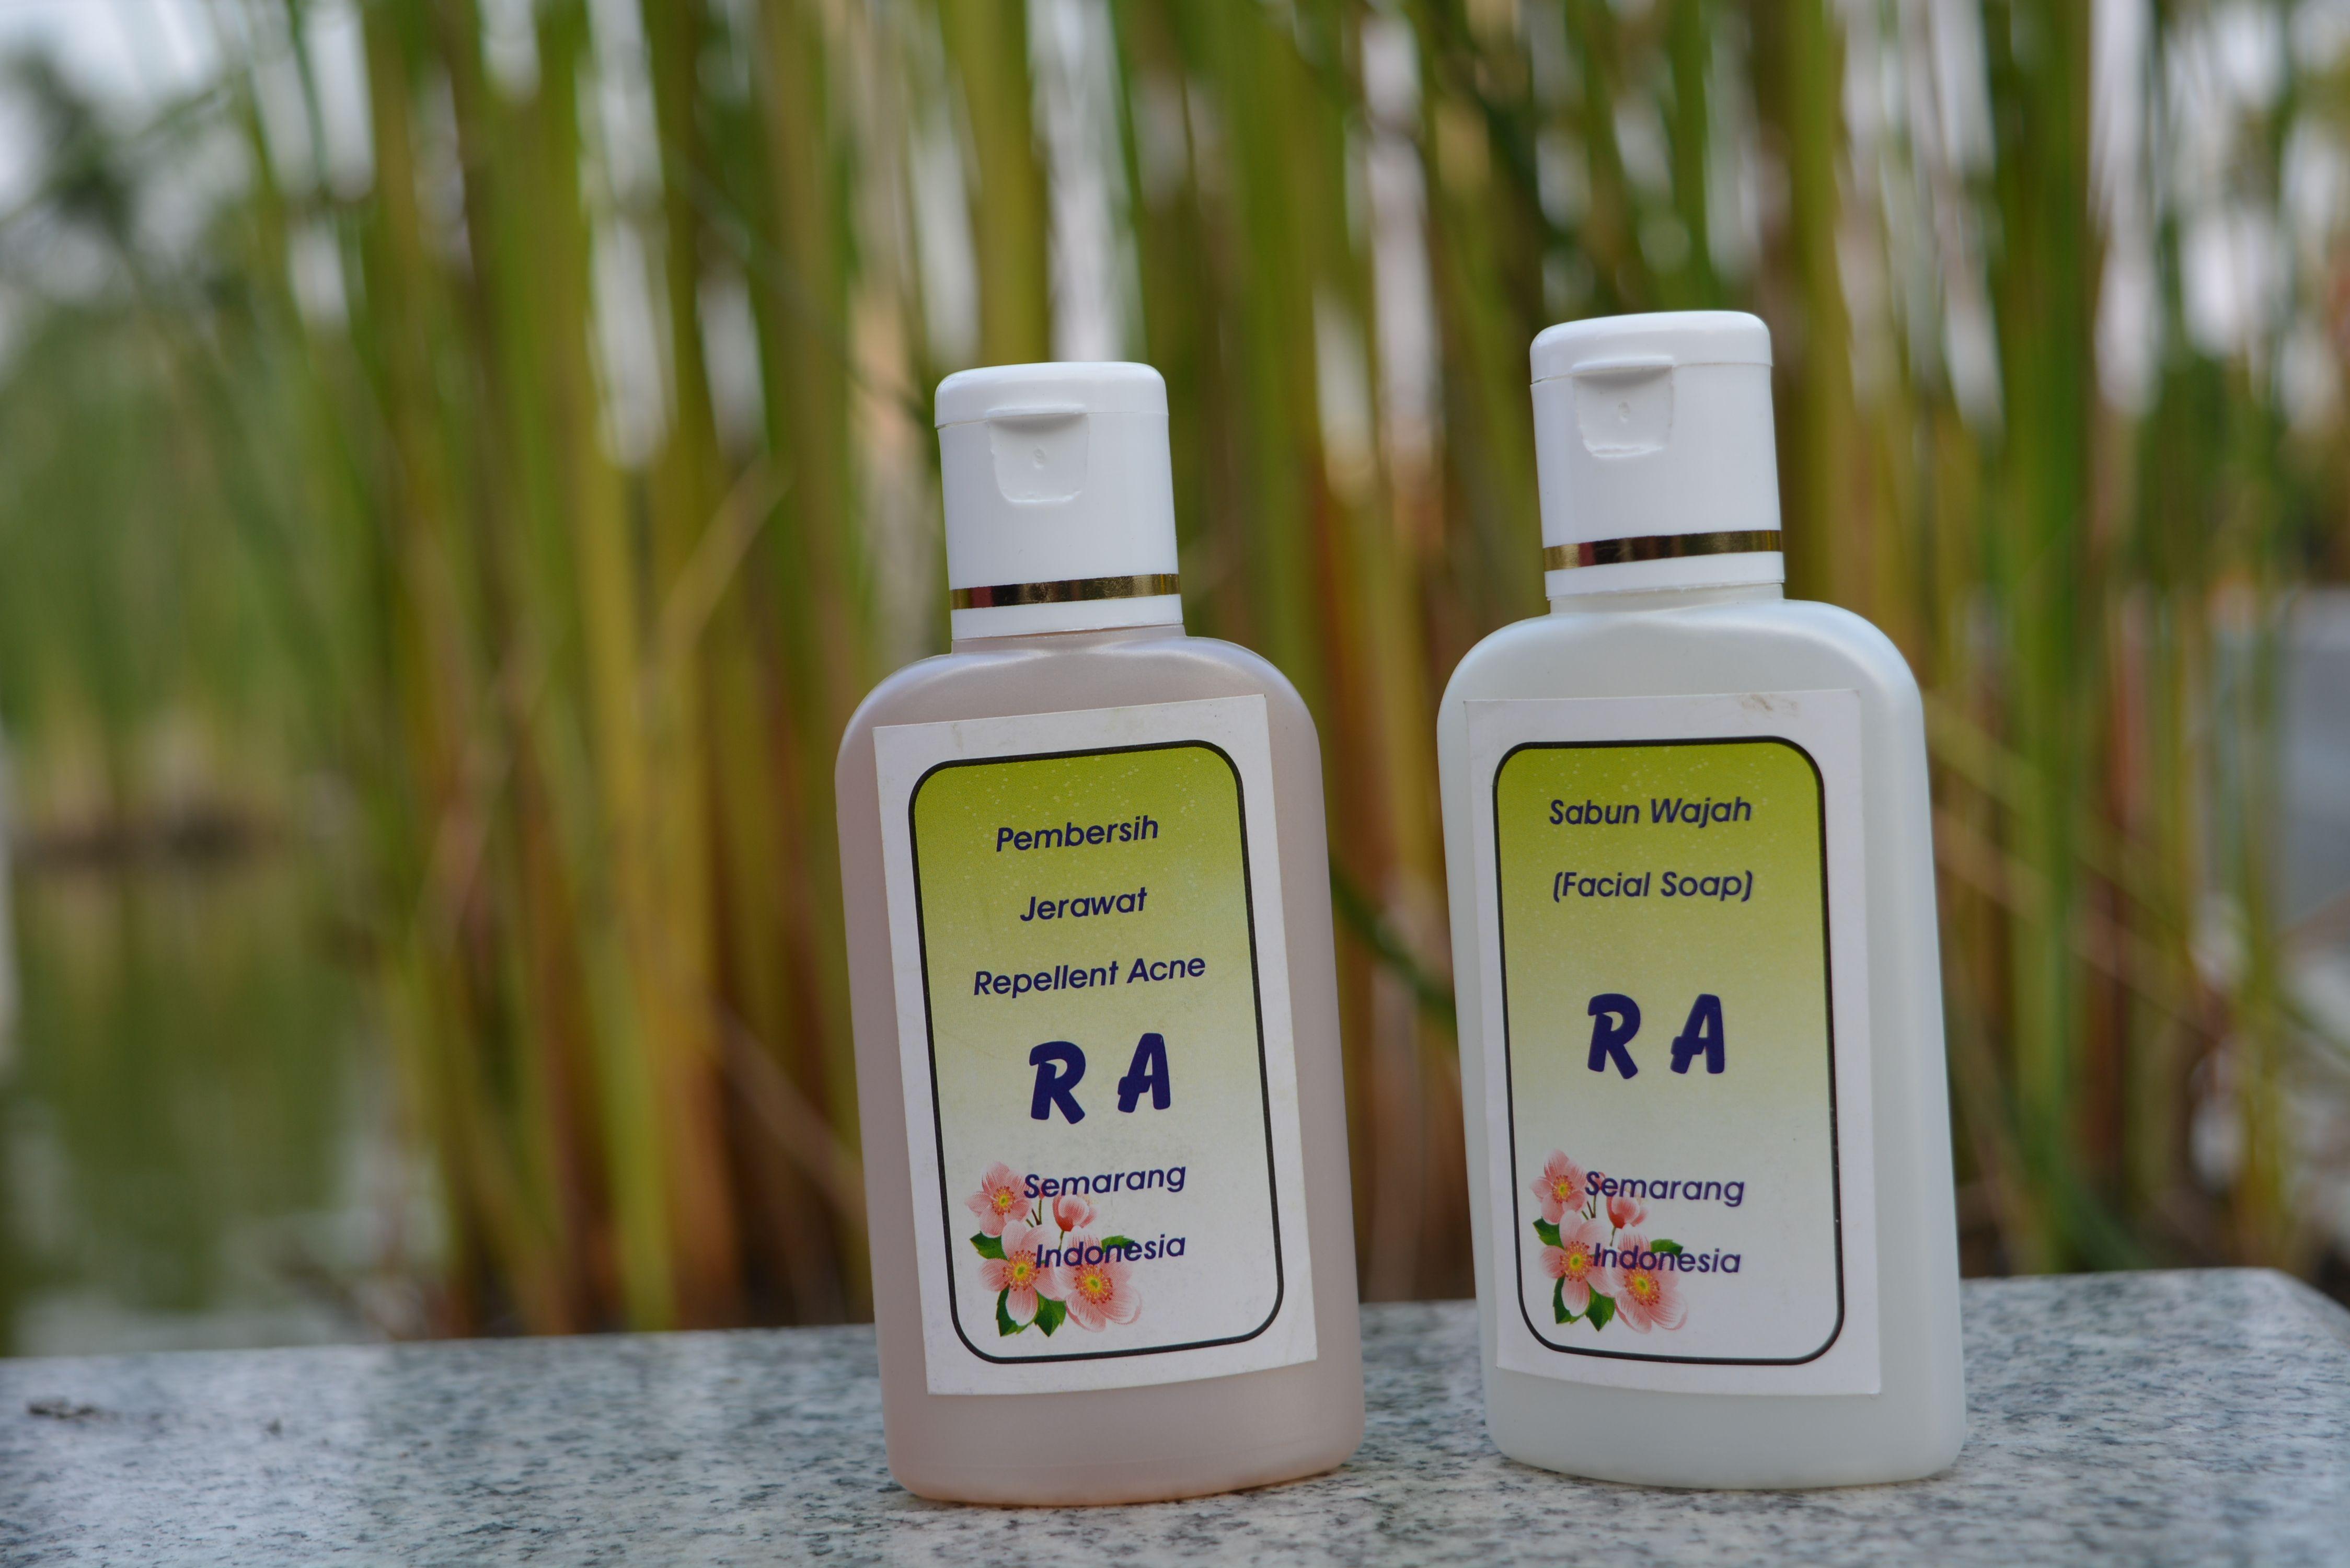 Sabun Yang Ampuh Menghilangkan Jerawat Dan Bekas Jerawat